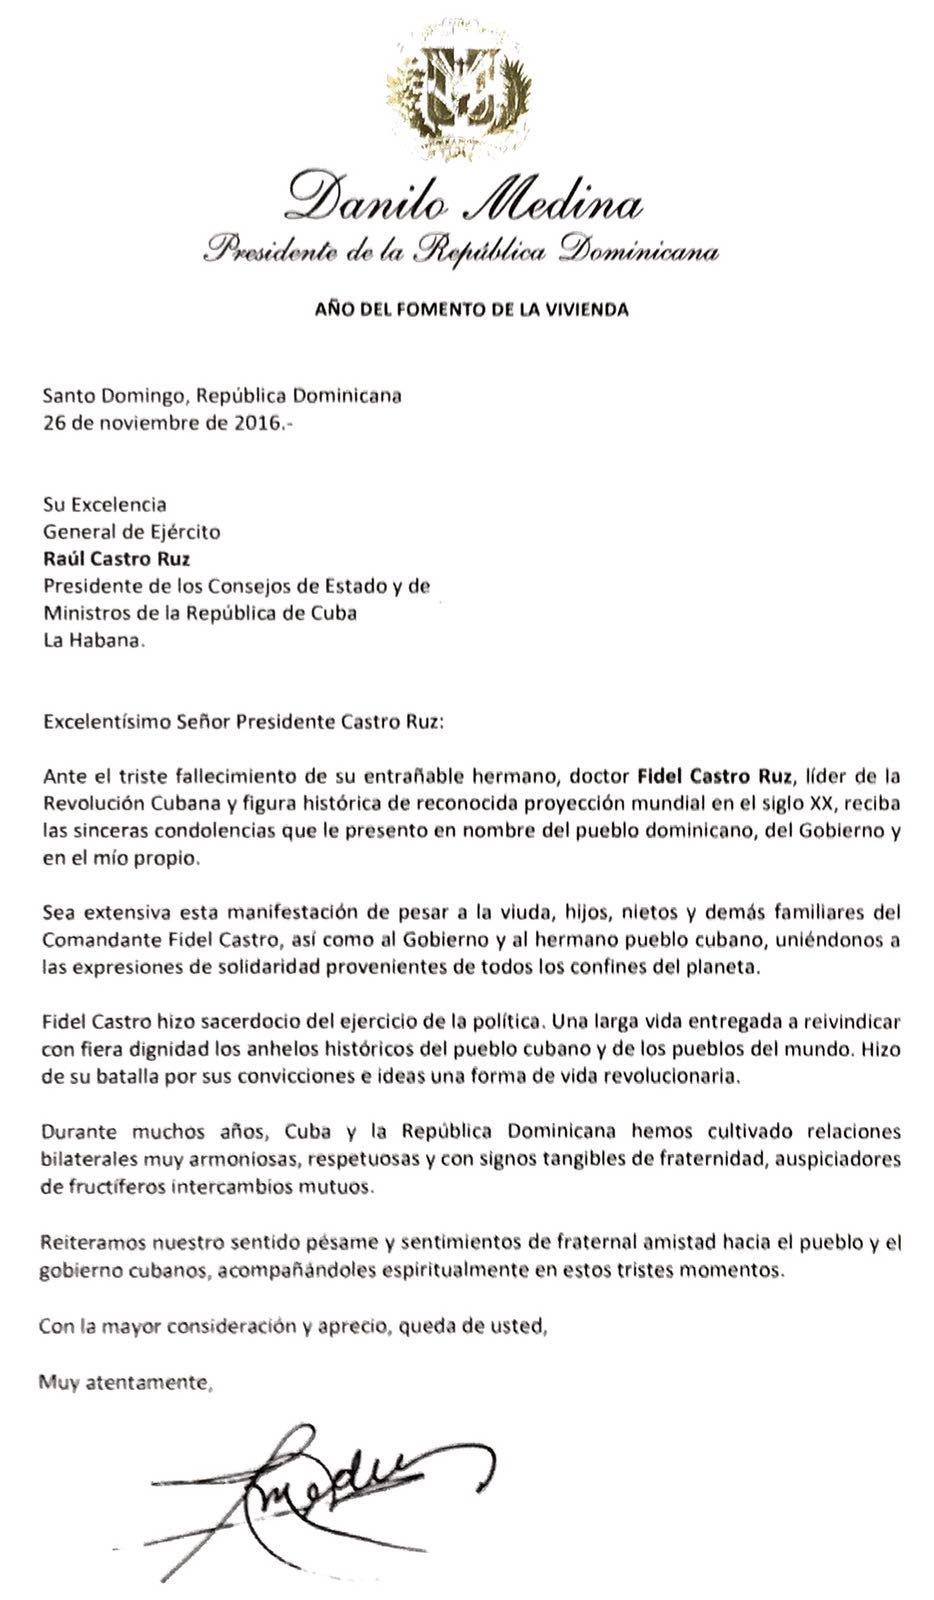 MANDATARIO - Danilo Medina lamenta fallecimiento de Fidel ... - photo#42